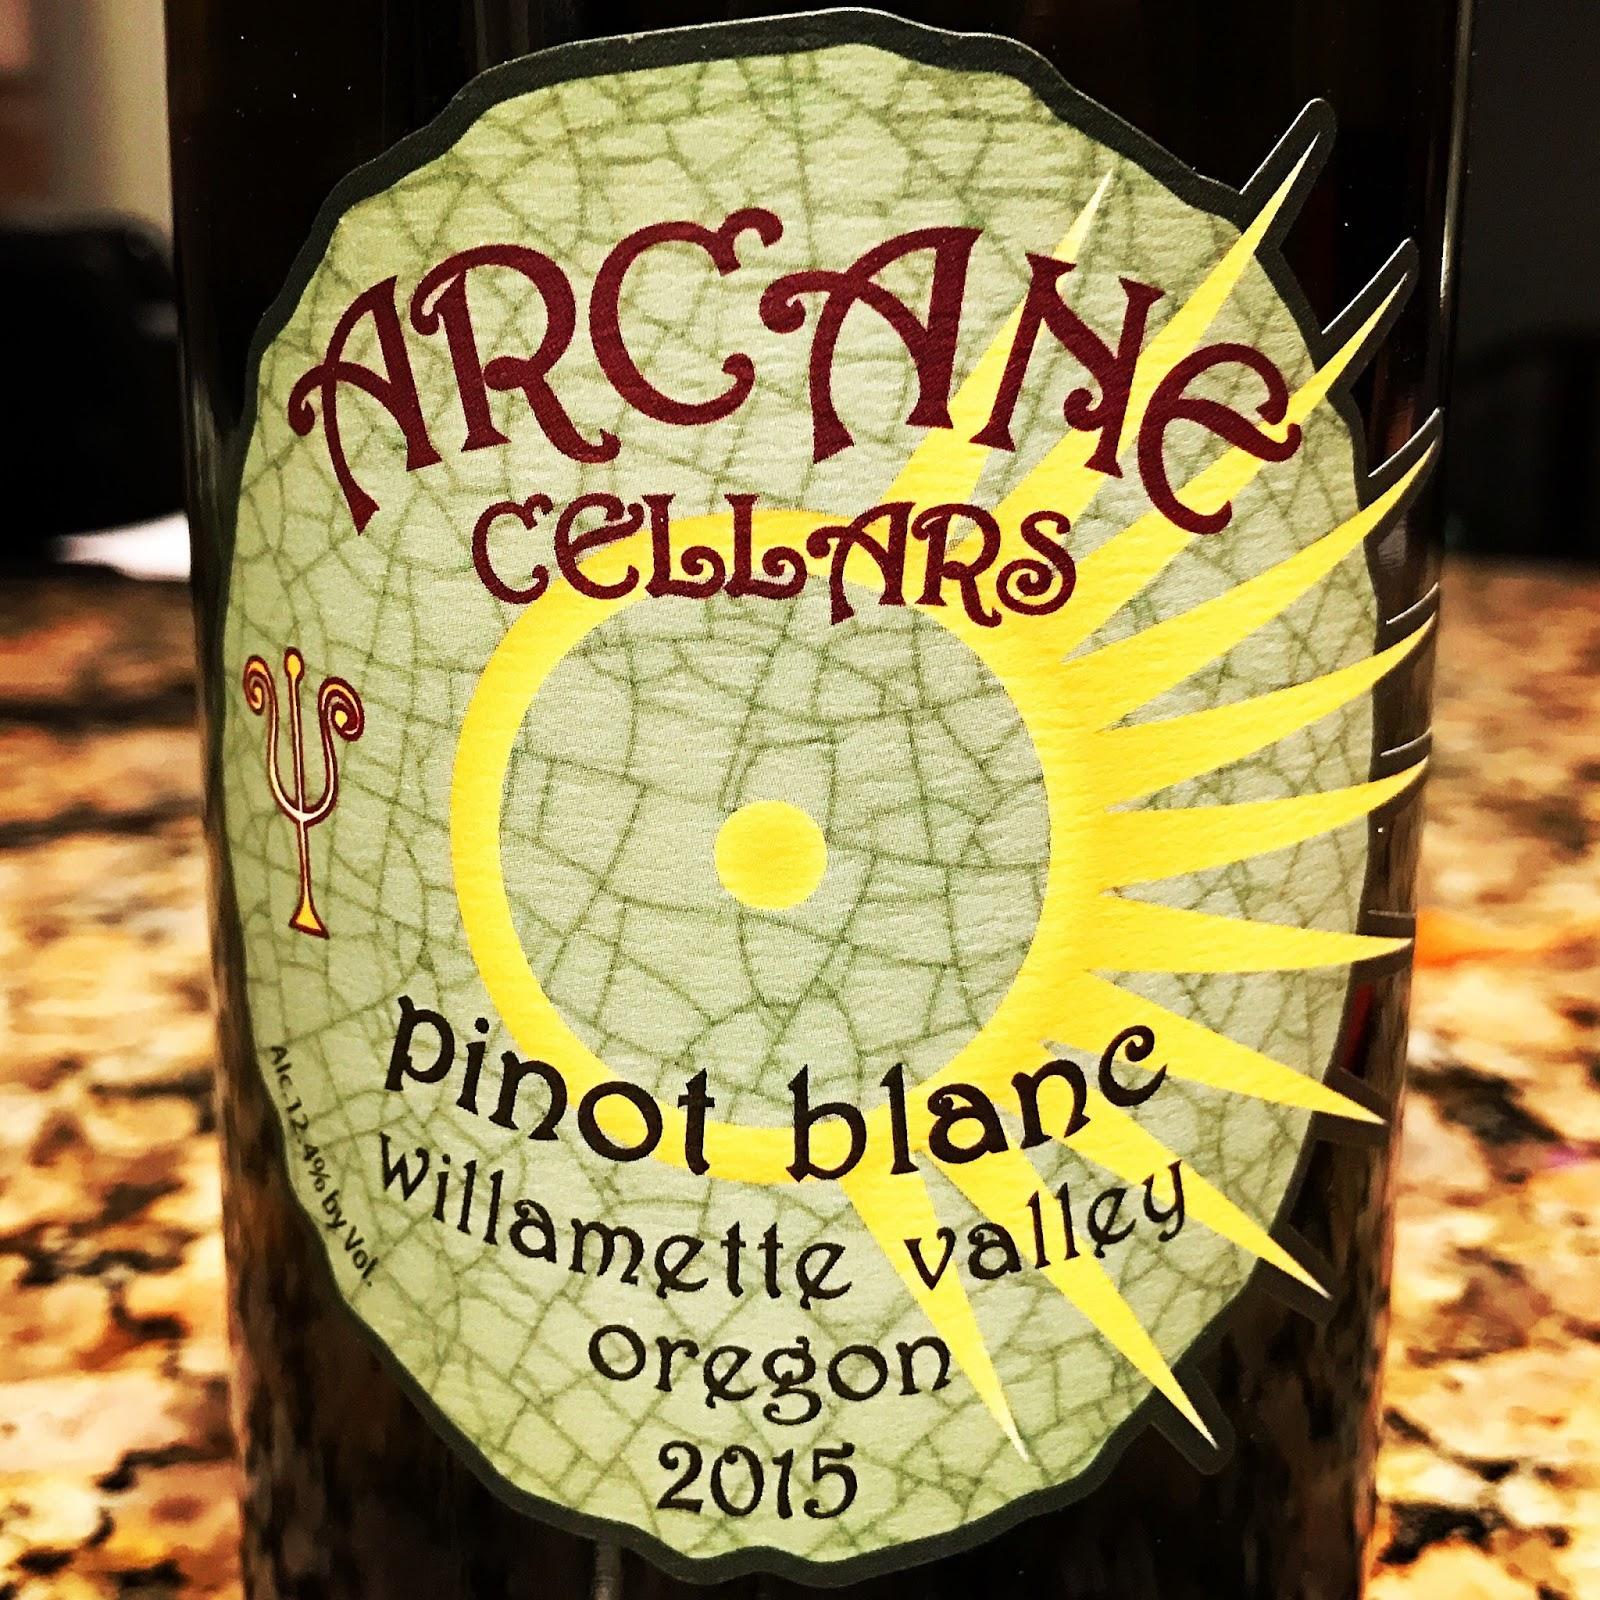 2015 Pinot Blanc produced u0026 bottled by Arcane Cellars (Salem Oregon).  sc 1 st  The Nittany Epicurean & 2015 Arcane Cellars Pinot Blanc | The Nittany Epicurean